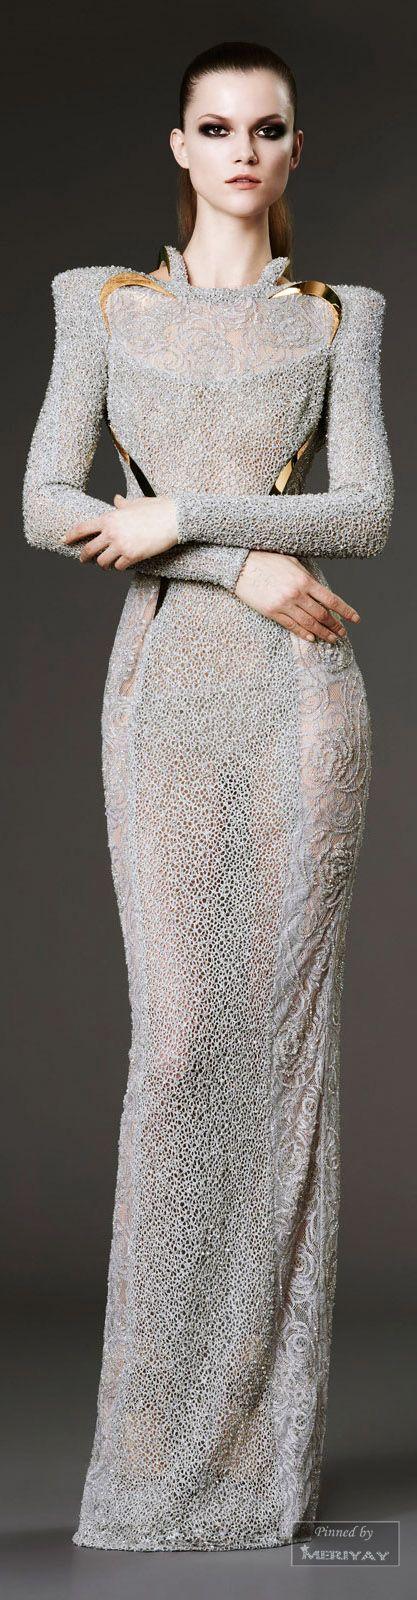 Lady Millionairess/karen cox....Atelier Versace.      jaglady